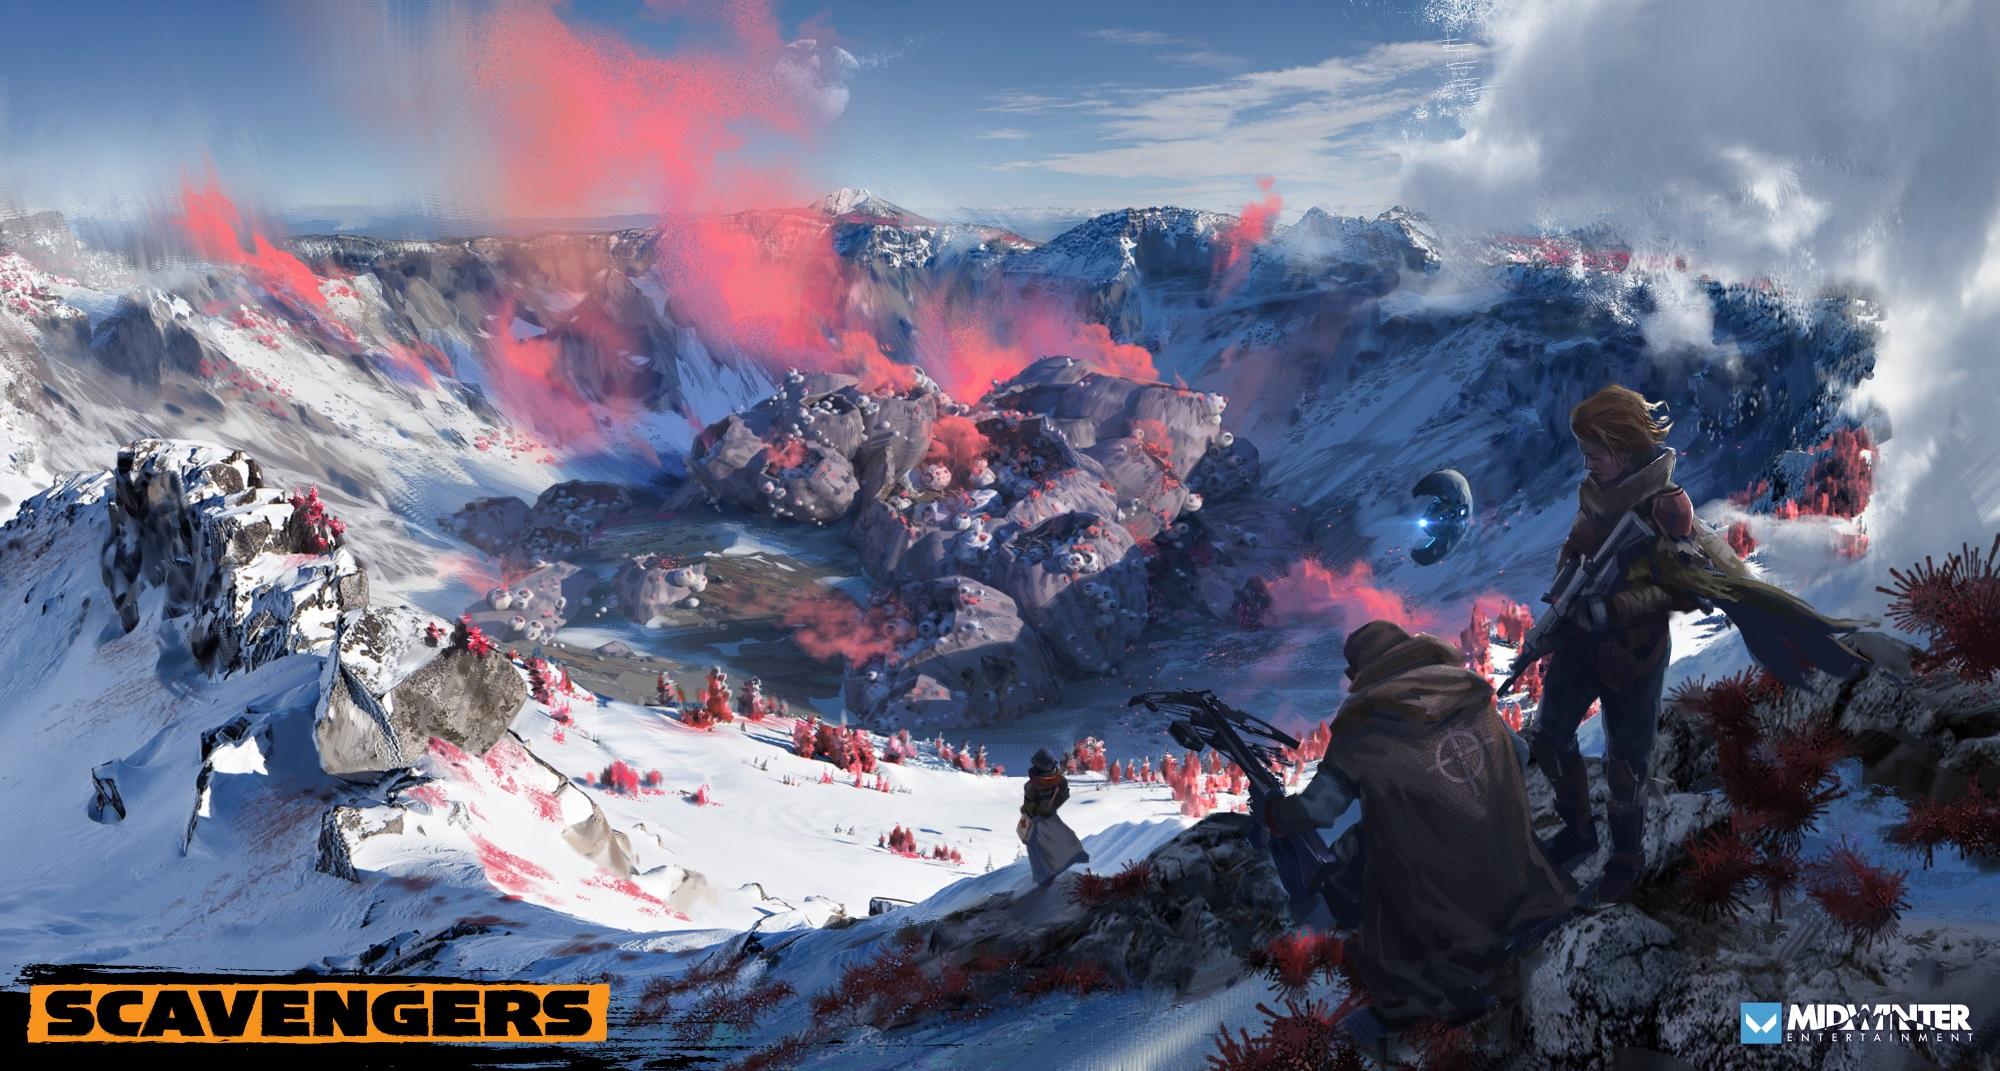 Scavengers: game de devs veteranos é inspirado no modo Warzone de Halo 5